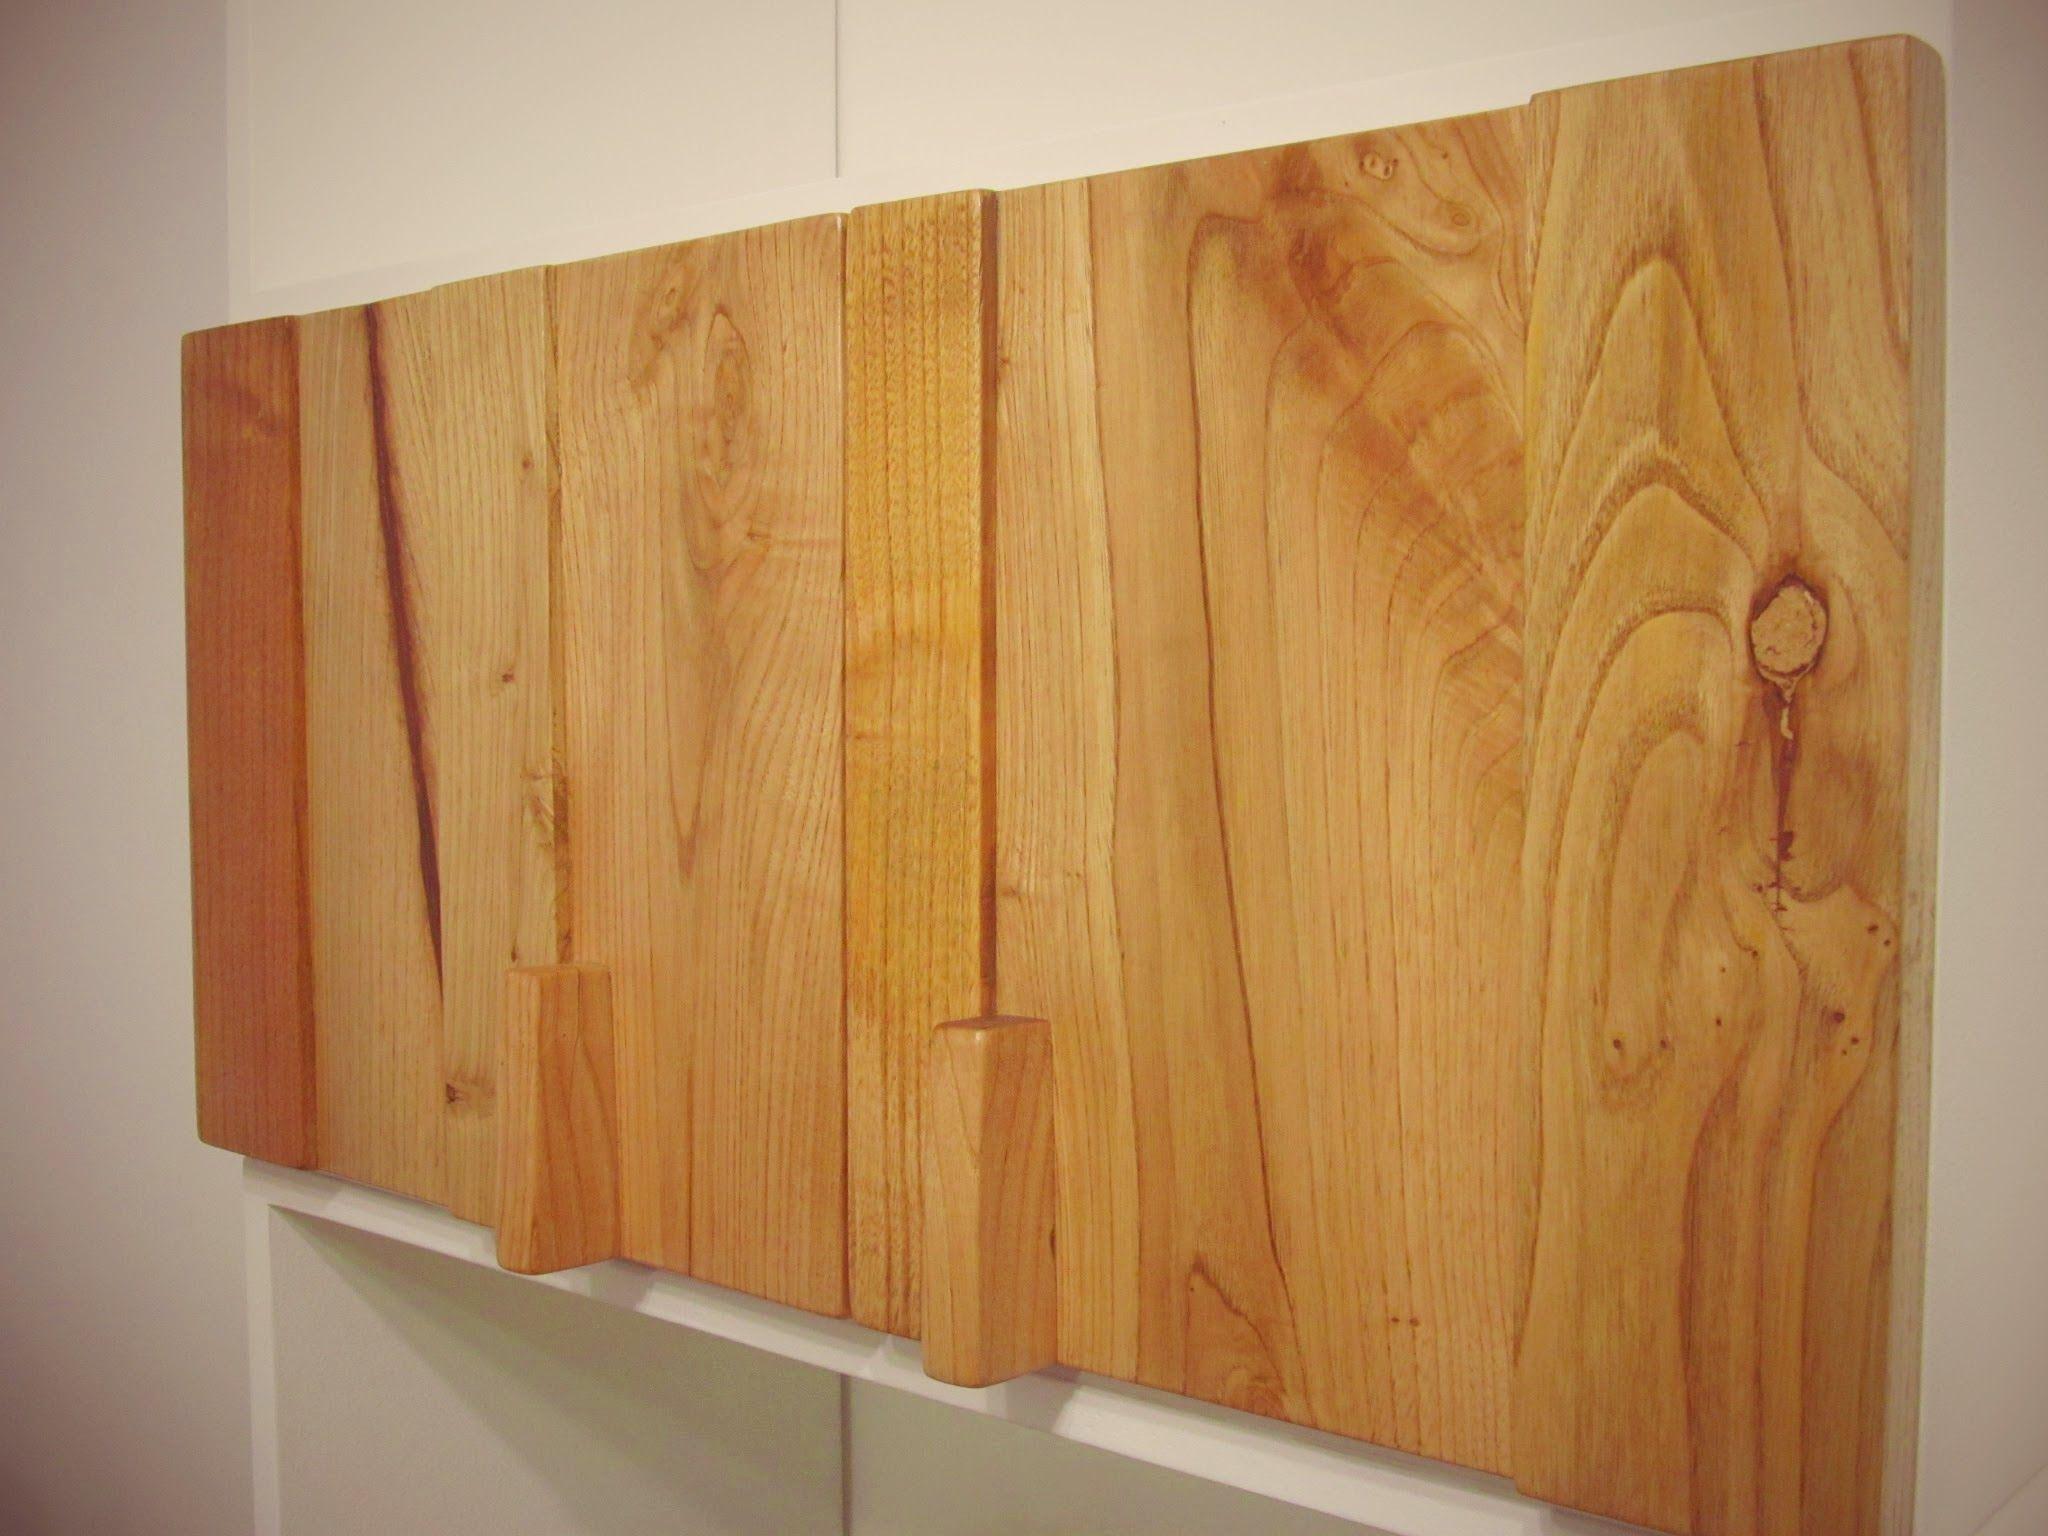 Puerta construida con retazos de madera de casta o textura estante pinterest - Puertas de castano ...